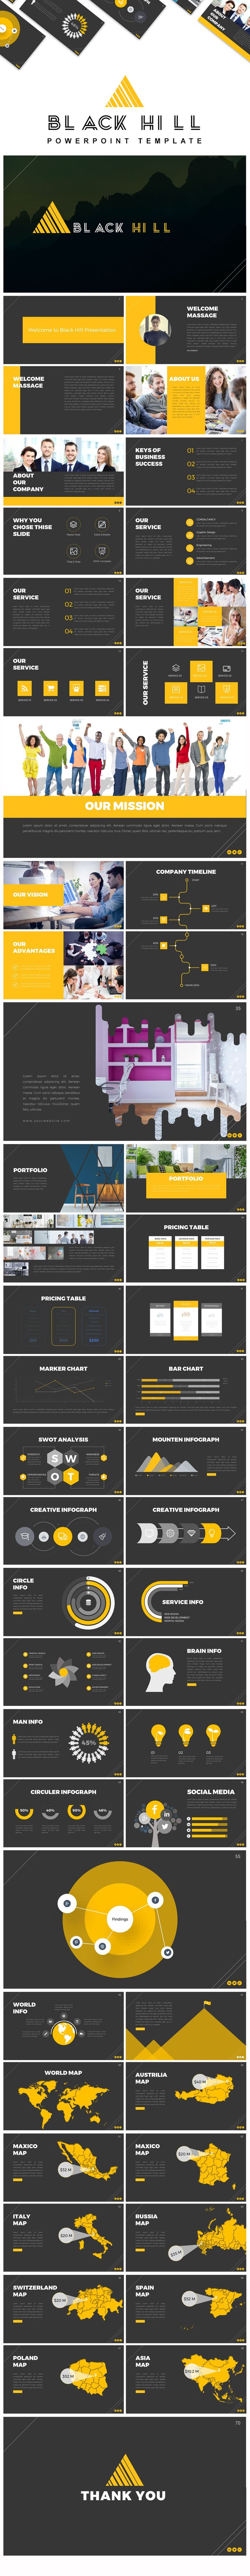 Black Hill Presentation PowerPoint Template